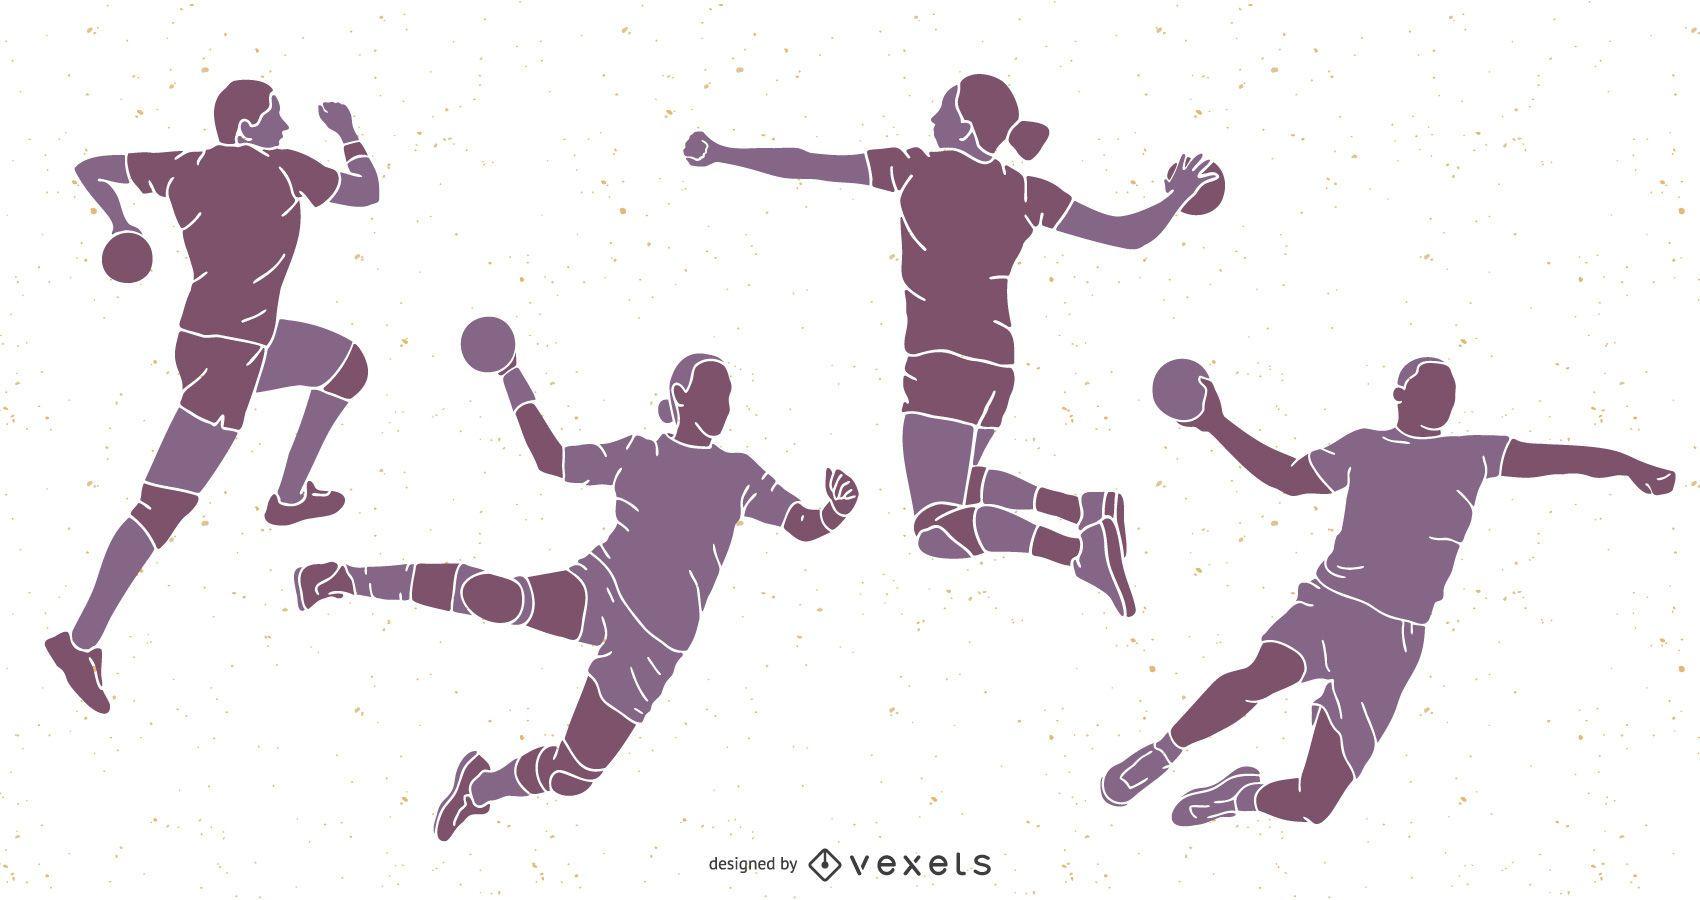 Handball Sports People Silhouette Pack